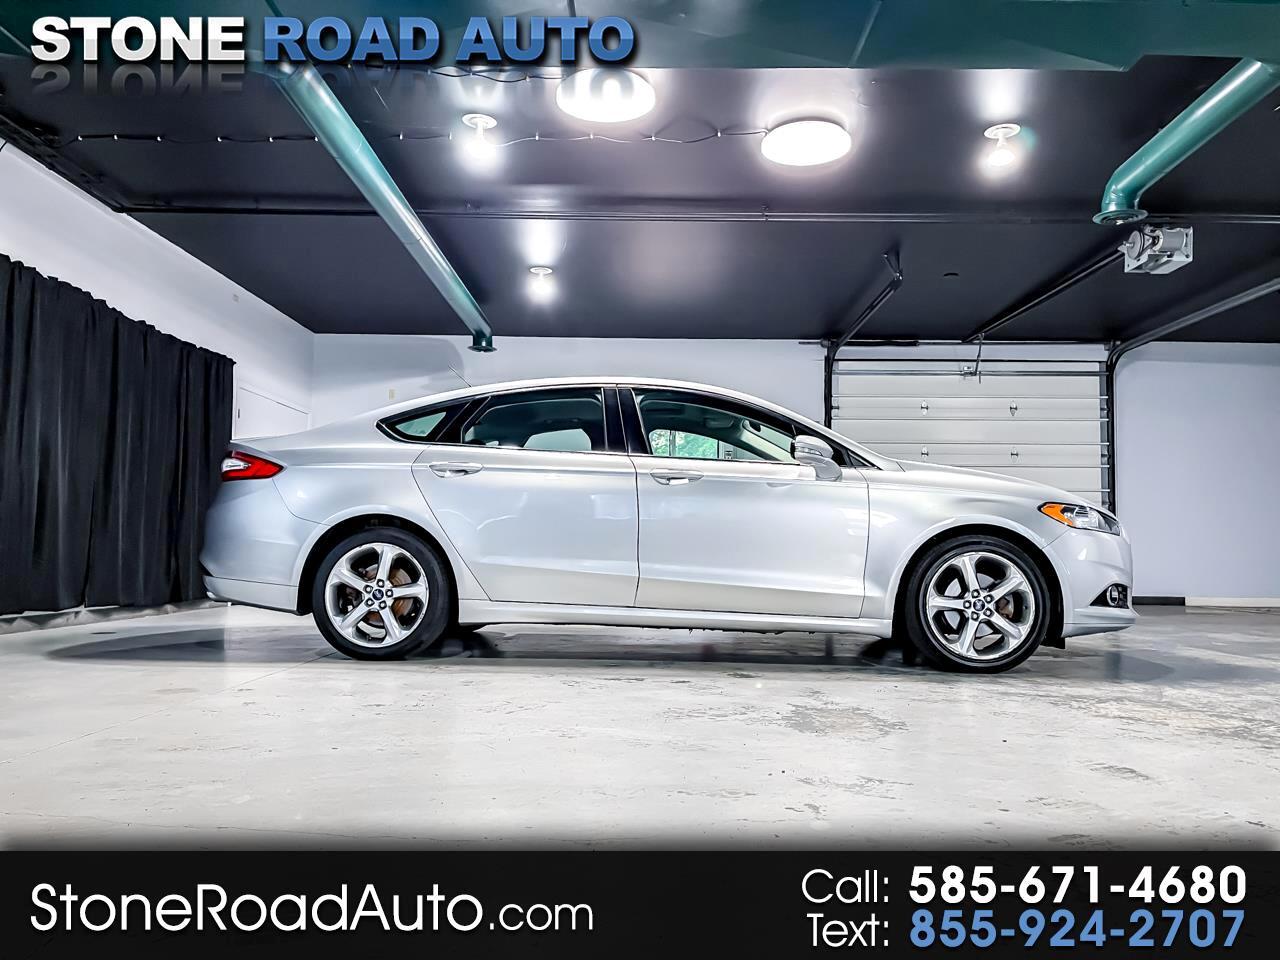 Ford Fusion 4dr Sdn SE Hybrid FWD 2013